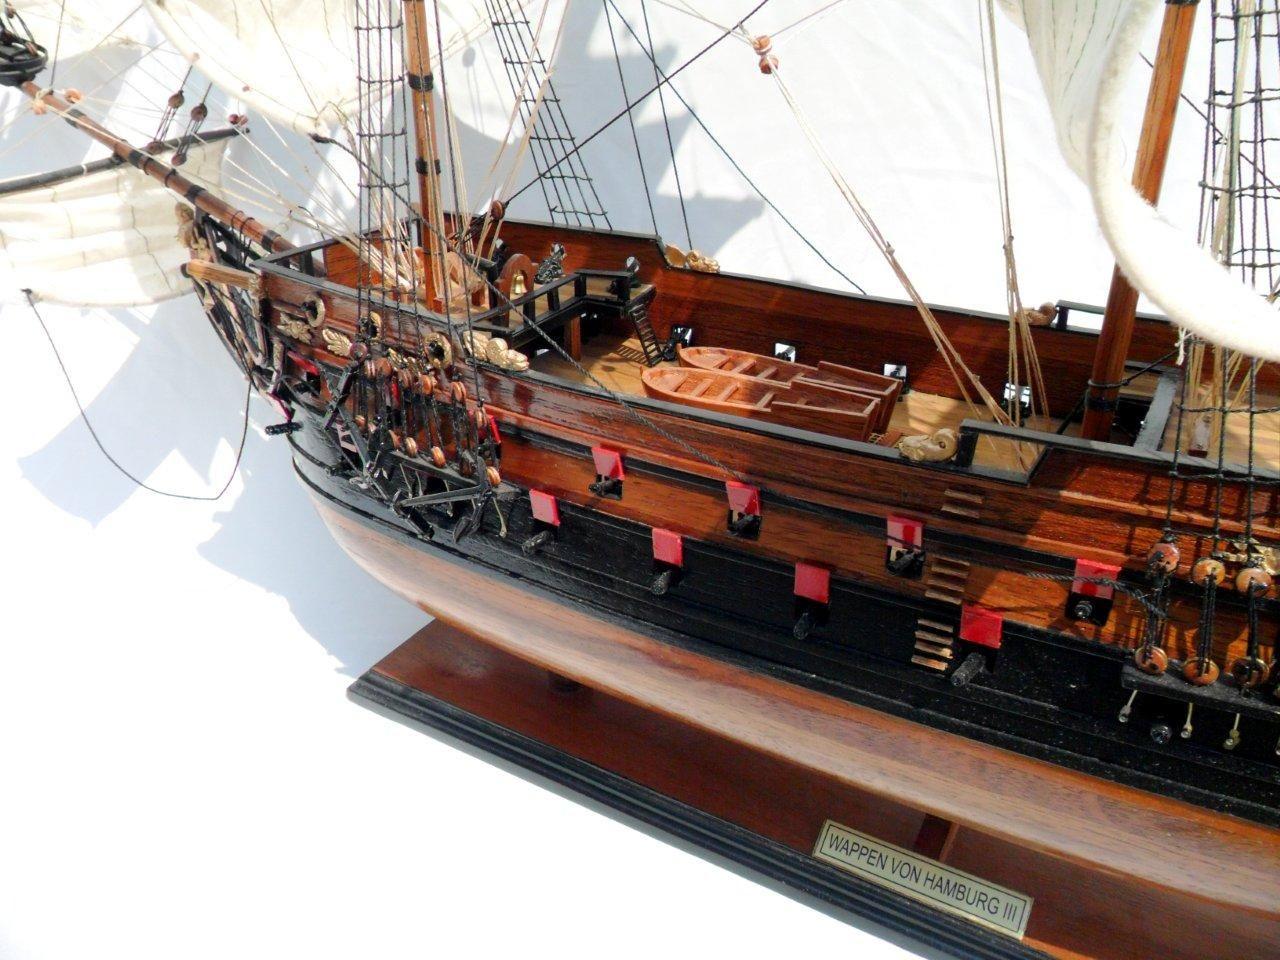 1996-12611-Wapen-von-Hamburg-III-Model-ship